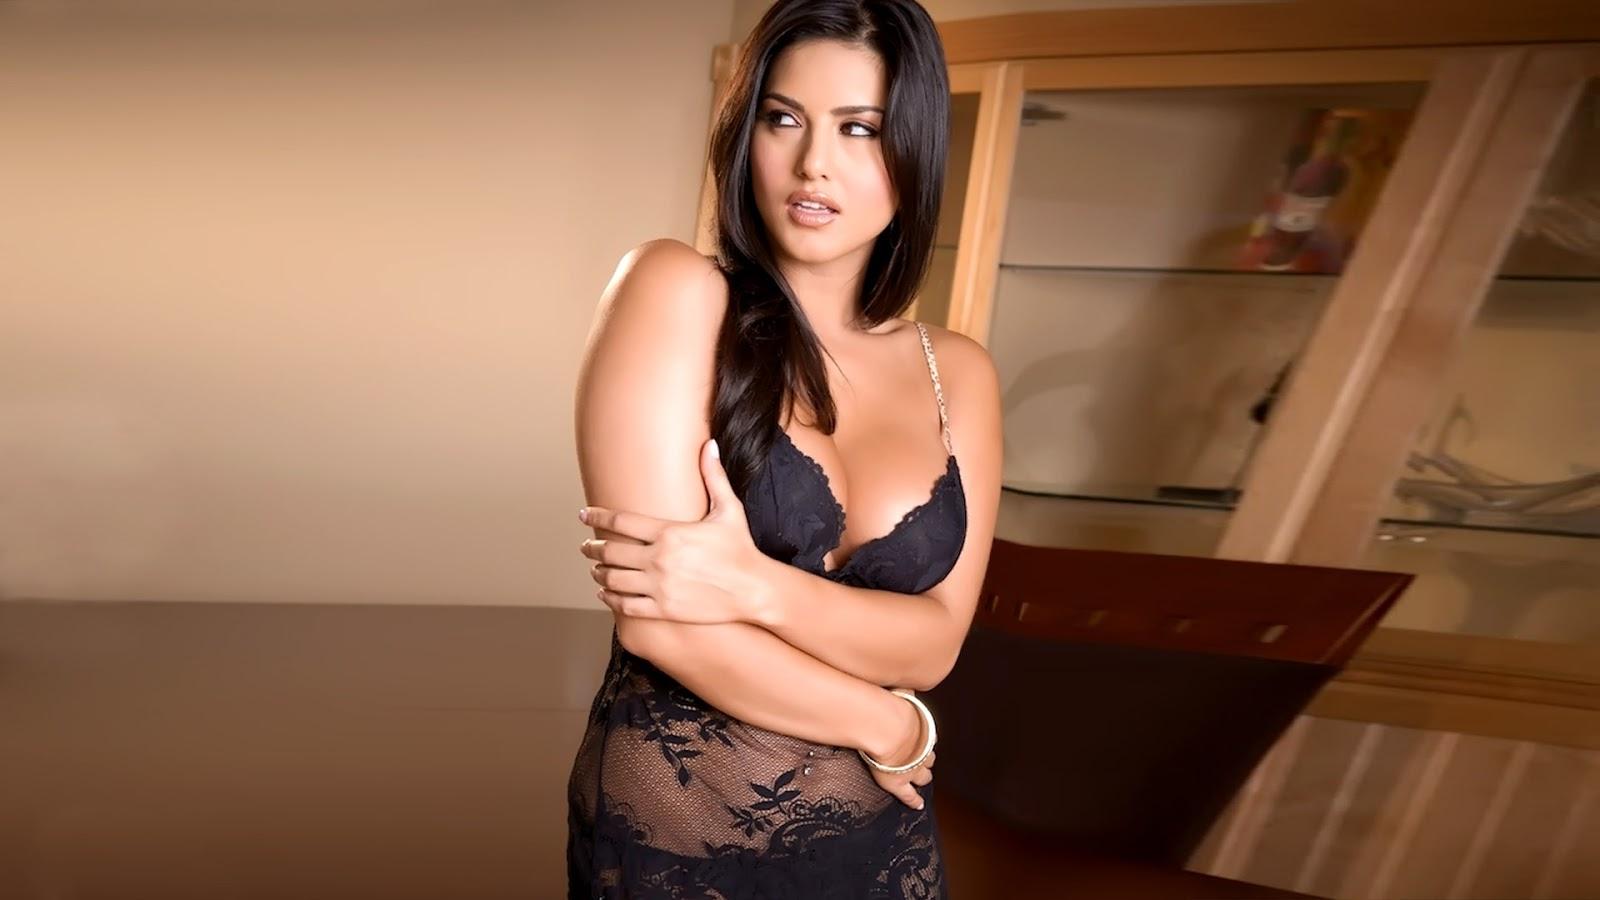 Zarine Khan Hottest Picture - Kiss,Sexy Videos,Bikini -2221